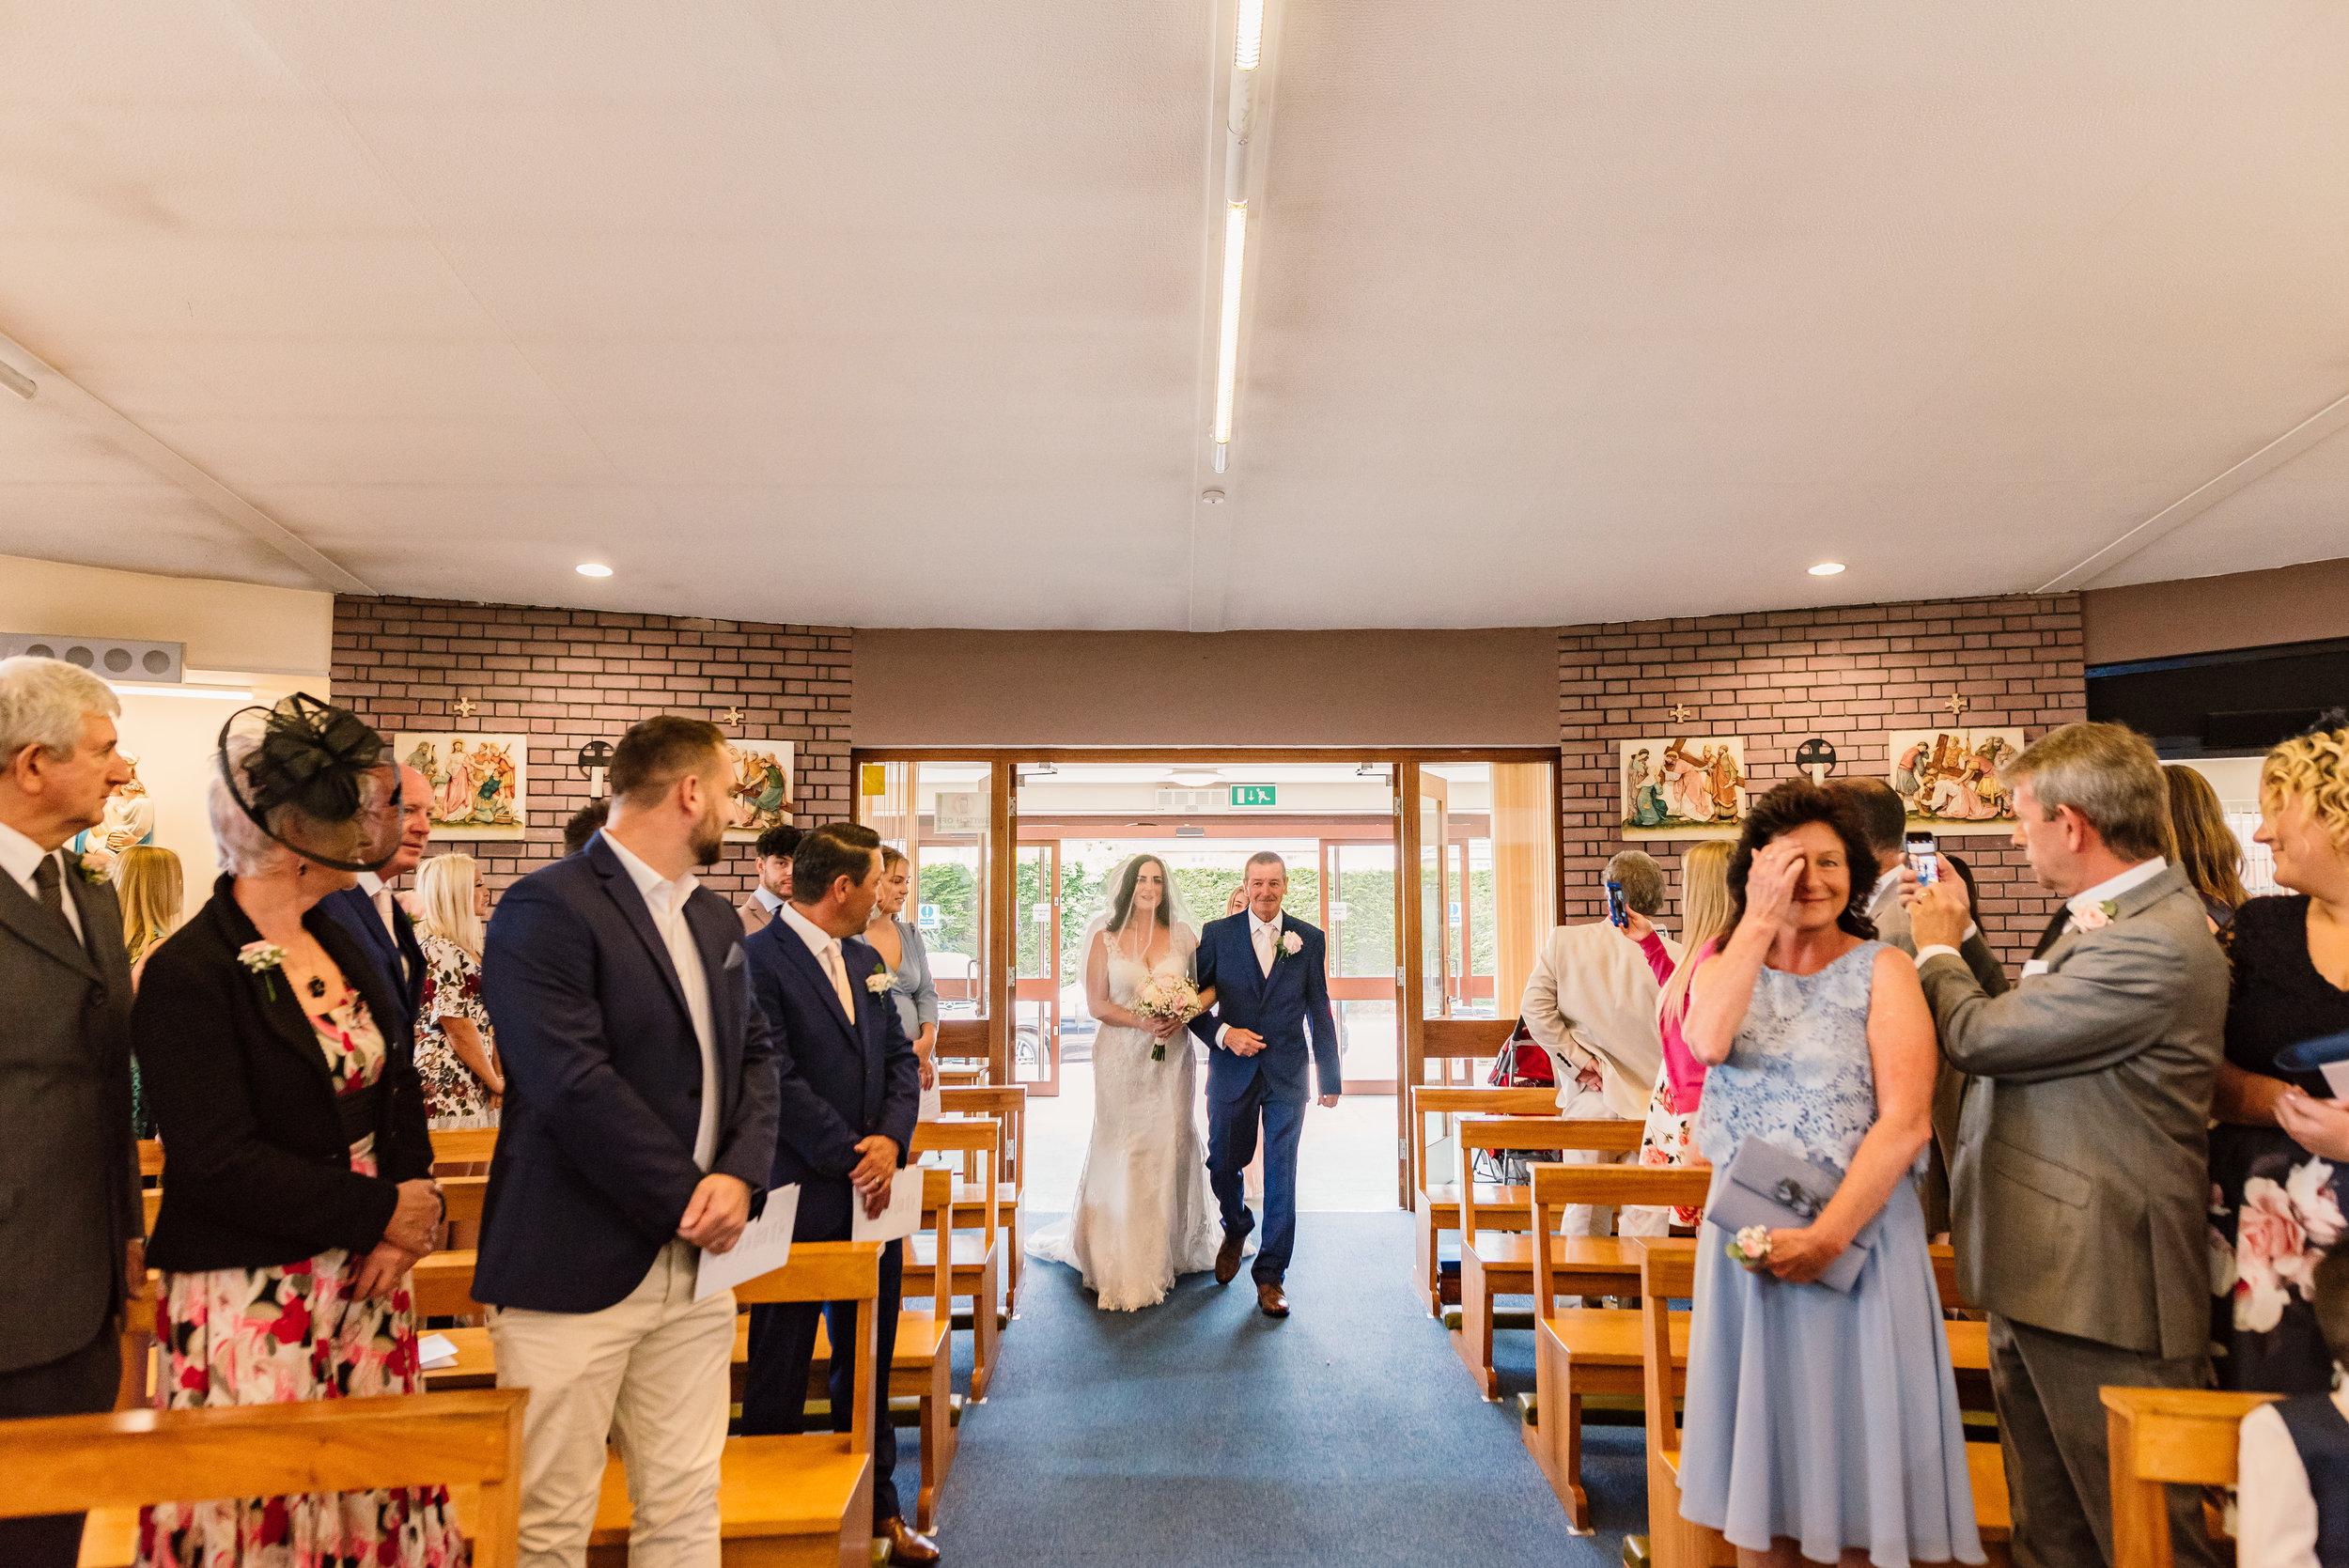 Sarah-Fishlock-Photography : Hampshire-wedding-photographer-hampshire : fleet-wedding-photographer-fleet : Meade-Hall-Wedding-Photographer : Meade-Hall-Wedding-Photos-427.jpg